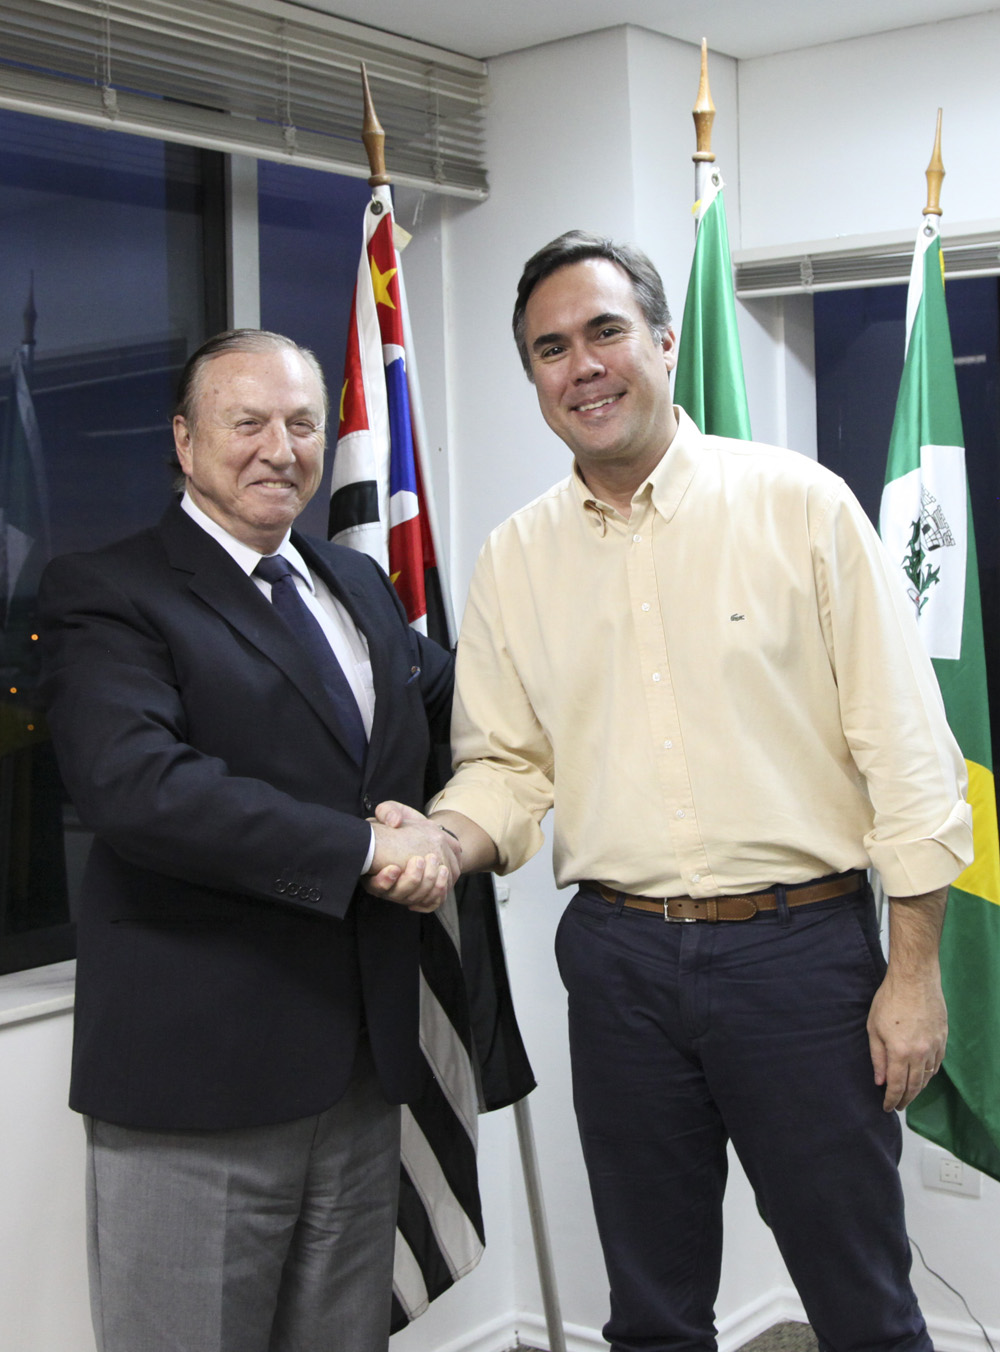 Eymael oferece apoio ao prefeito Andia